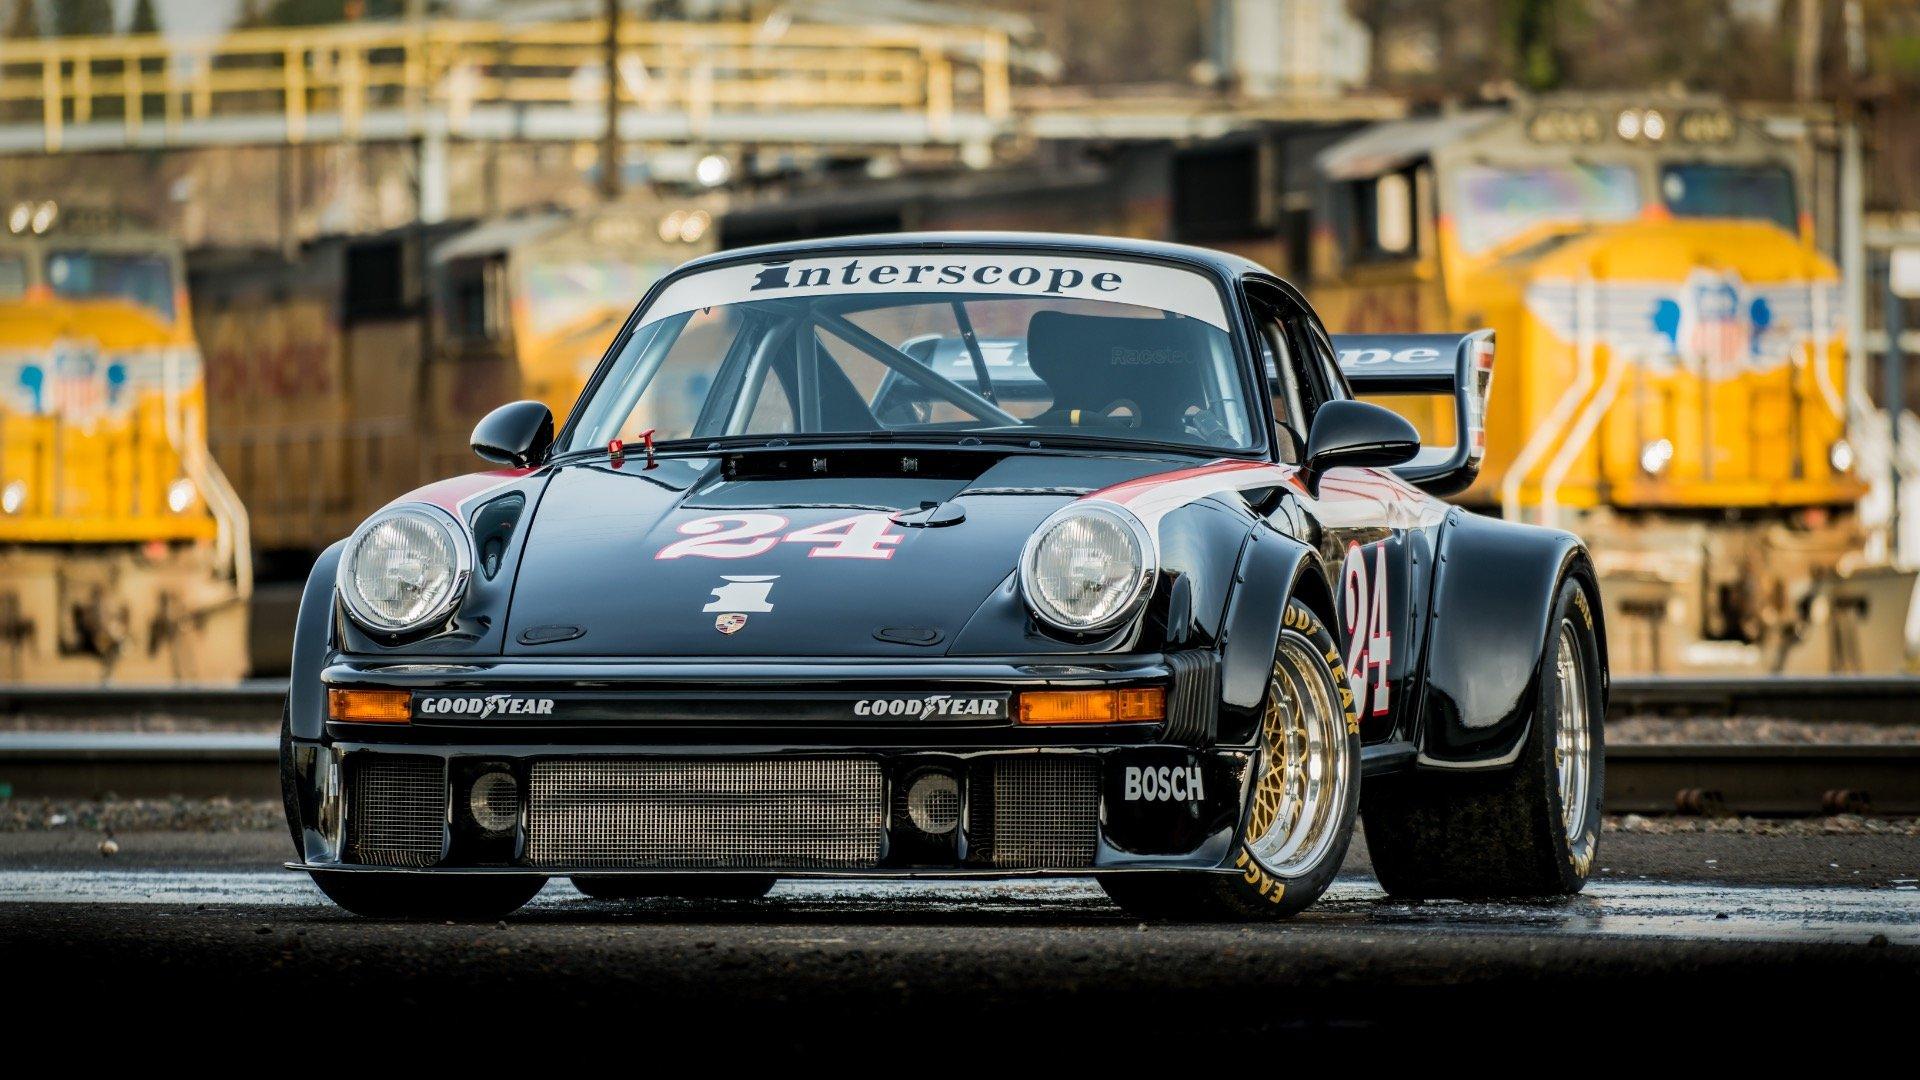 1986 Porsche Interscope 934.5 Race Car $127k spent  $159.9 For Sale (picture 1 of 6)